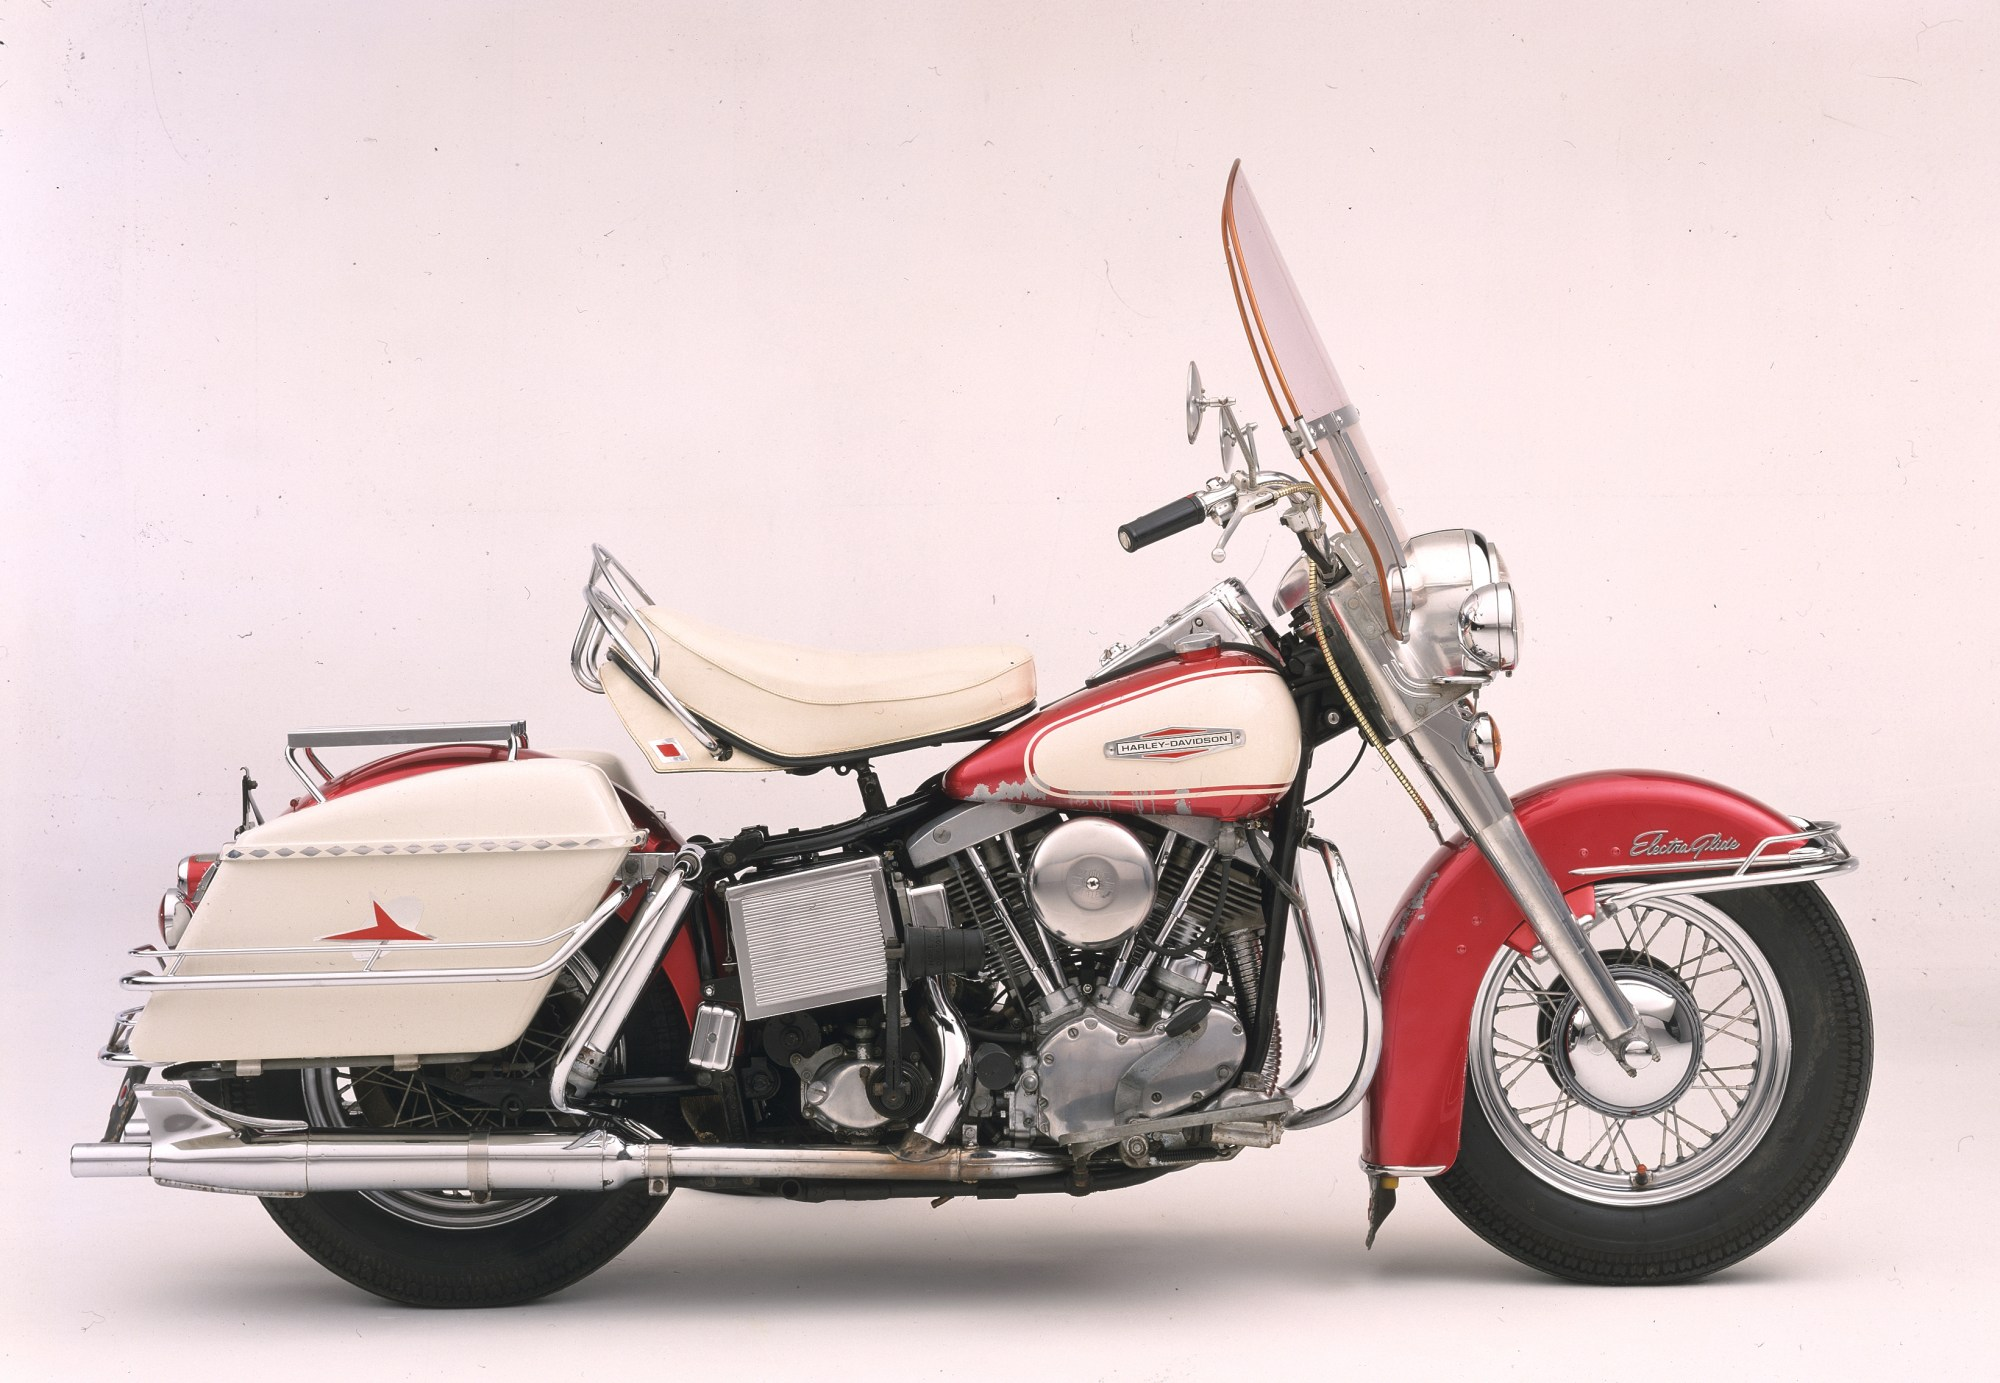 hight resolution of harley davidson shovelhead v twin motorcycles history of the big shovelhead exhaust systems diagram